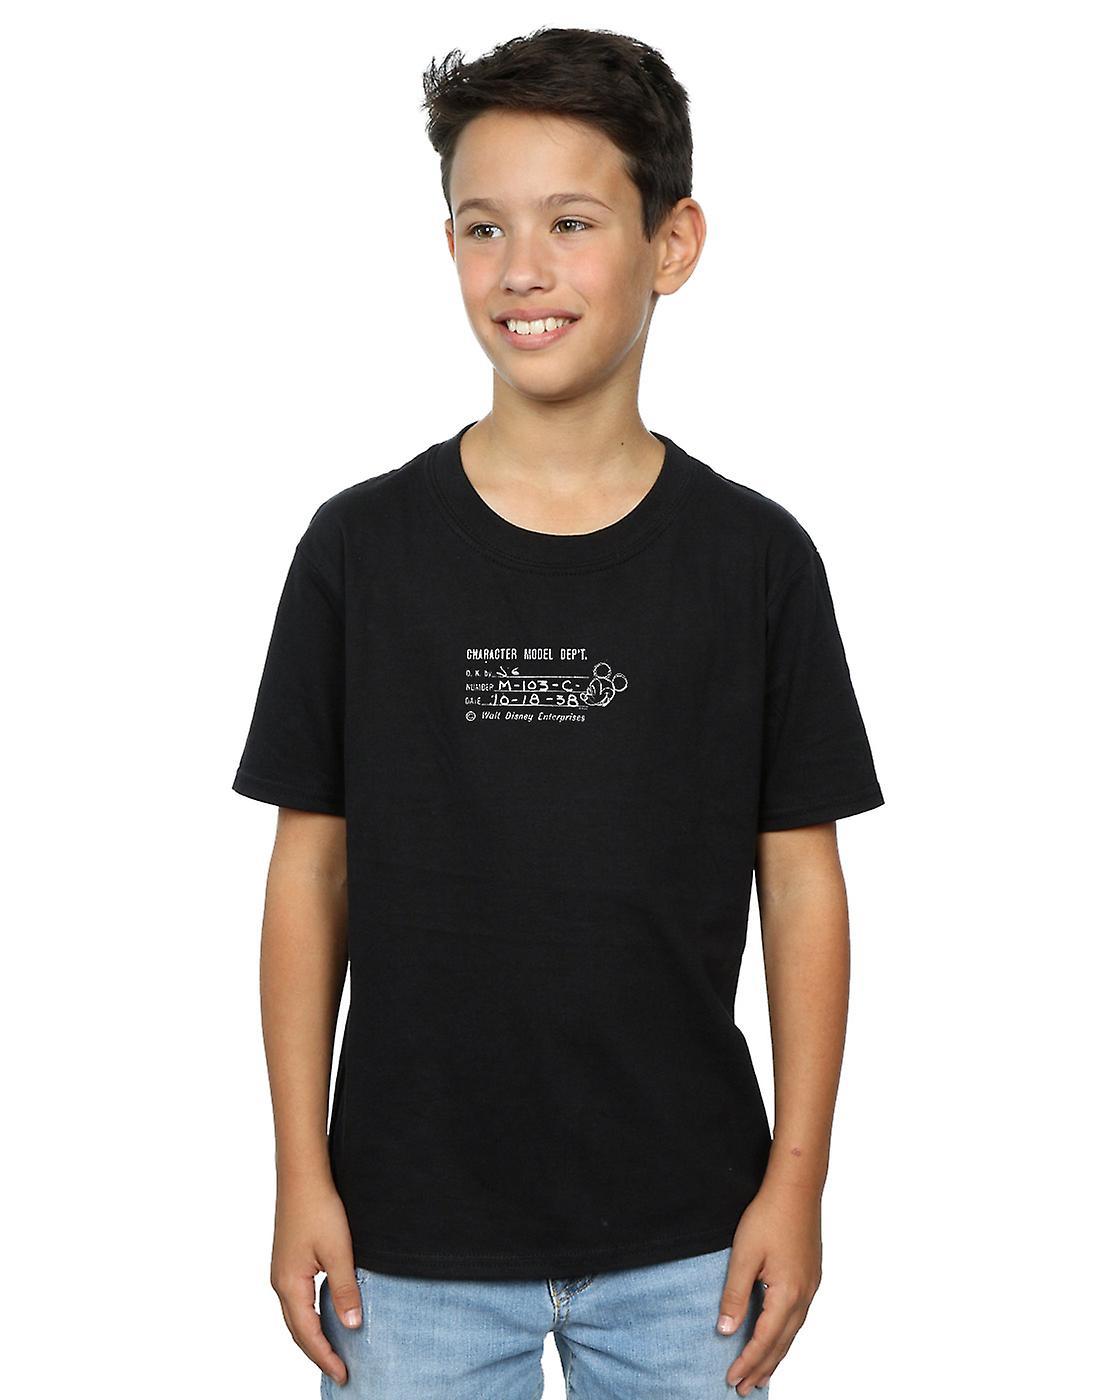 Disney Boys Mickey Mouse Character Model Dept. T-Shirt